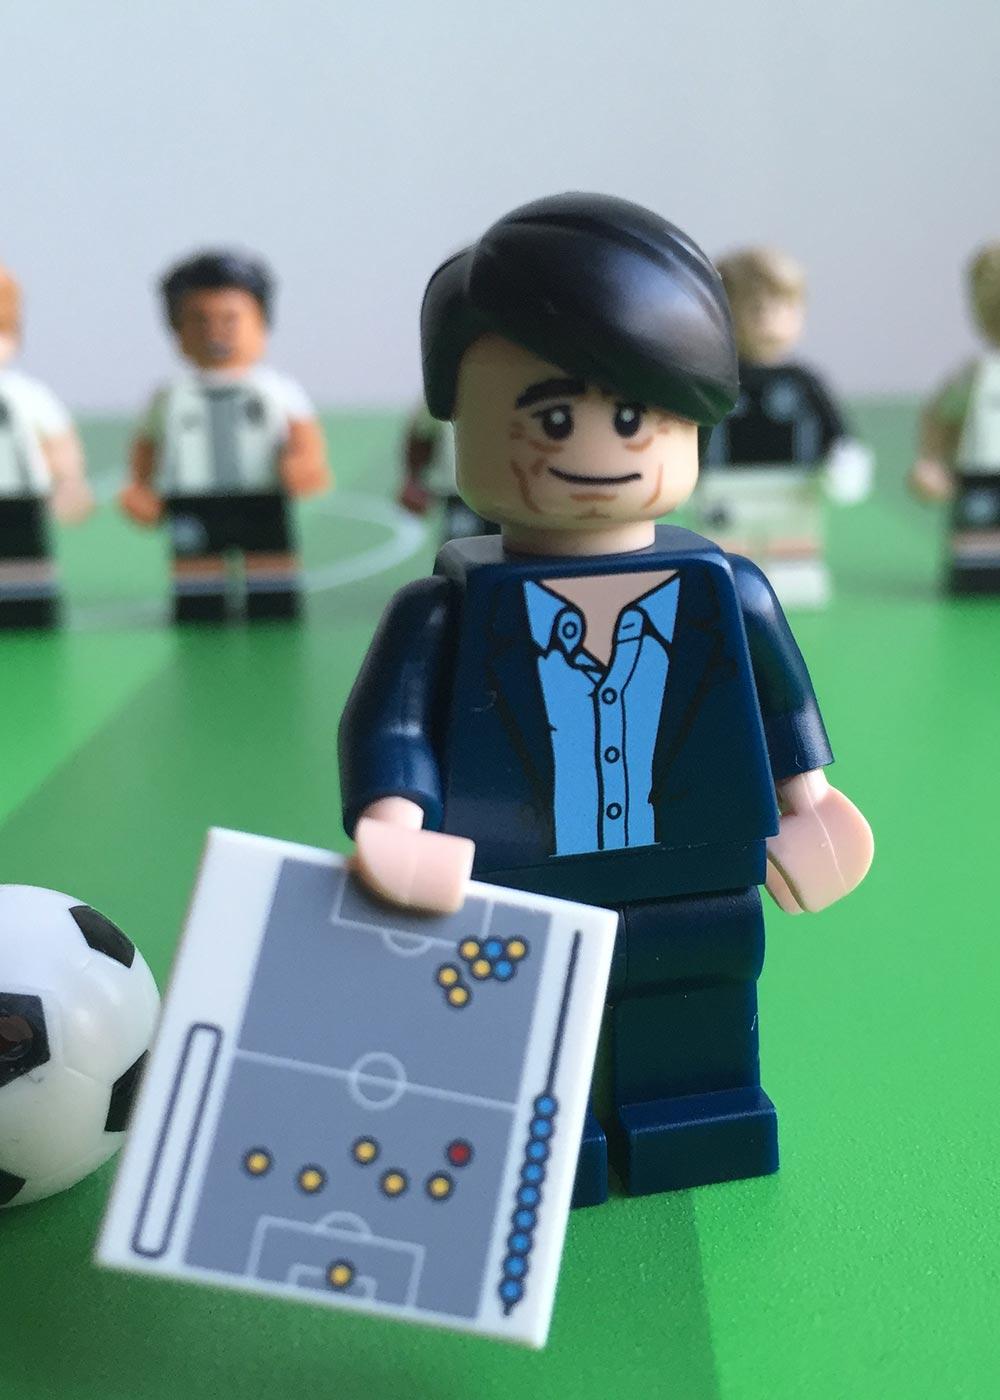 Ikea Dundra Spieltisch Fussballfeld gün Teilansicht Lego